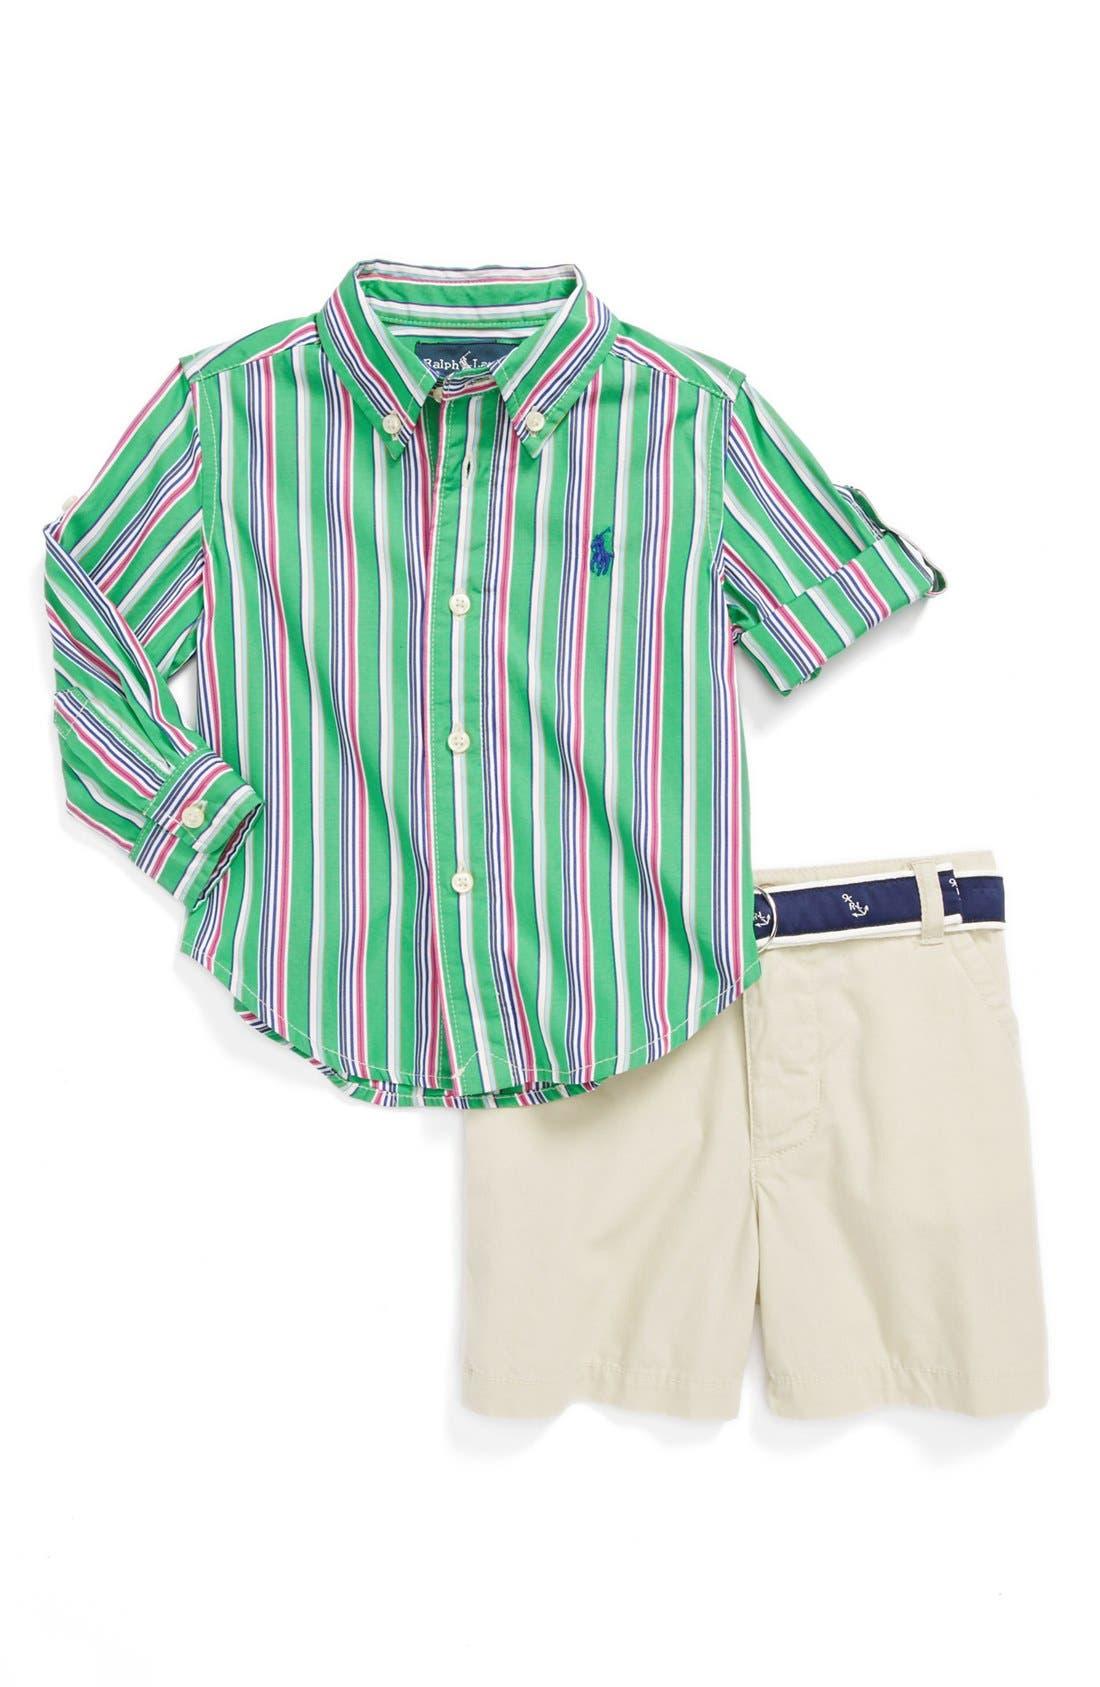 Alternate Image 1 Selected - Ralph Lauren Woven Shirt & Shorts (Baby Boys)